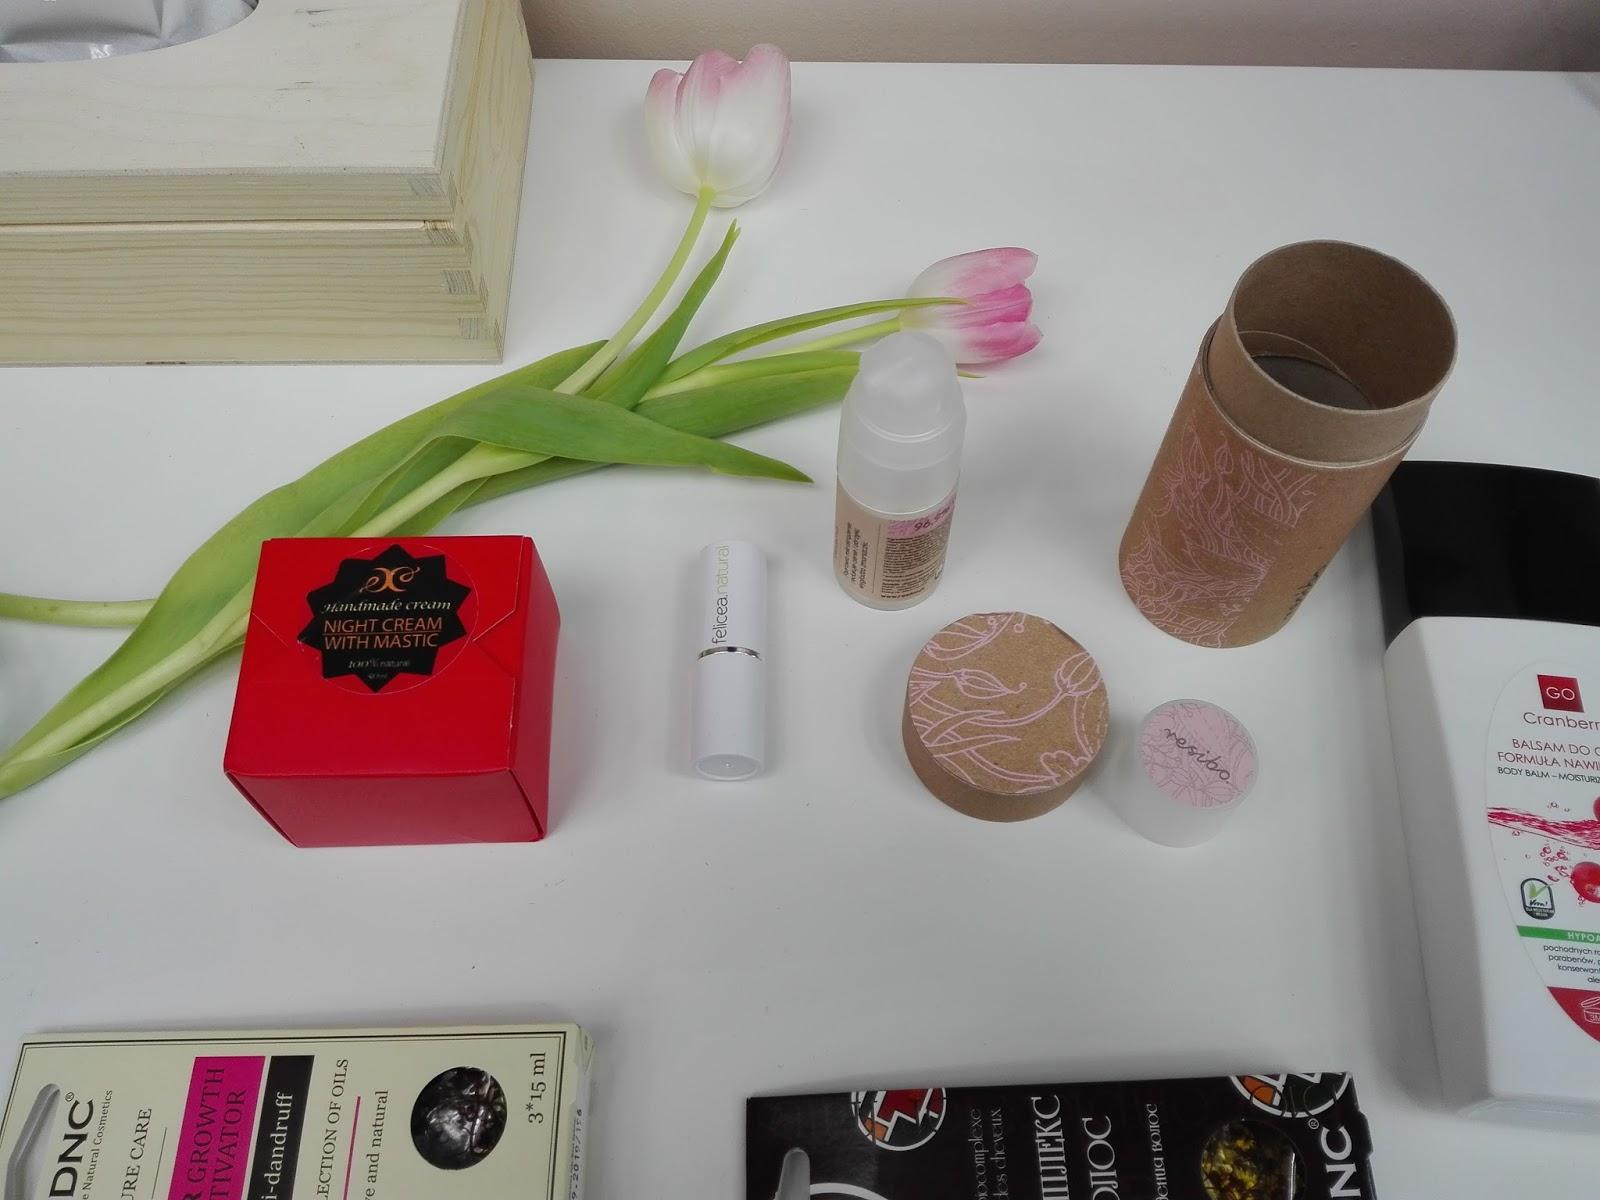 Kosmetyki naturalne, resibo, krem pod oczy, felicea, hristina, nova kosmetyki, dnc